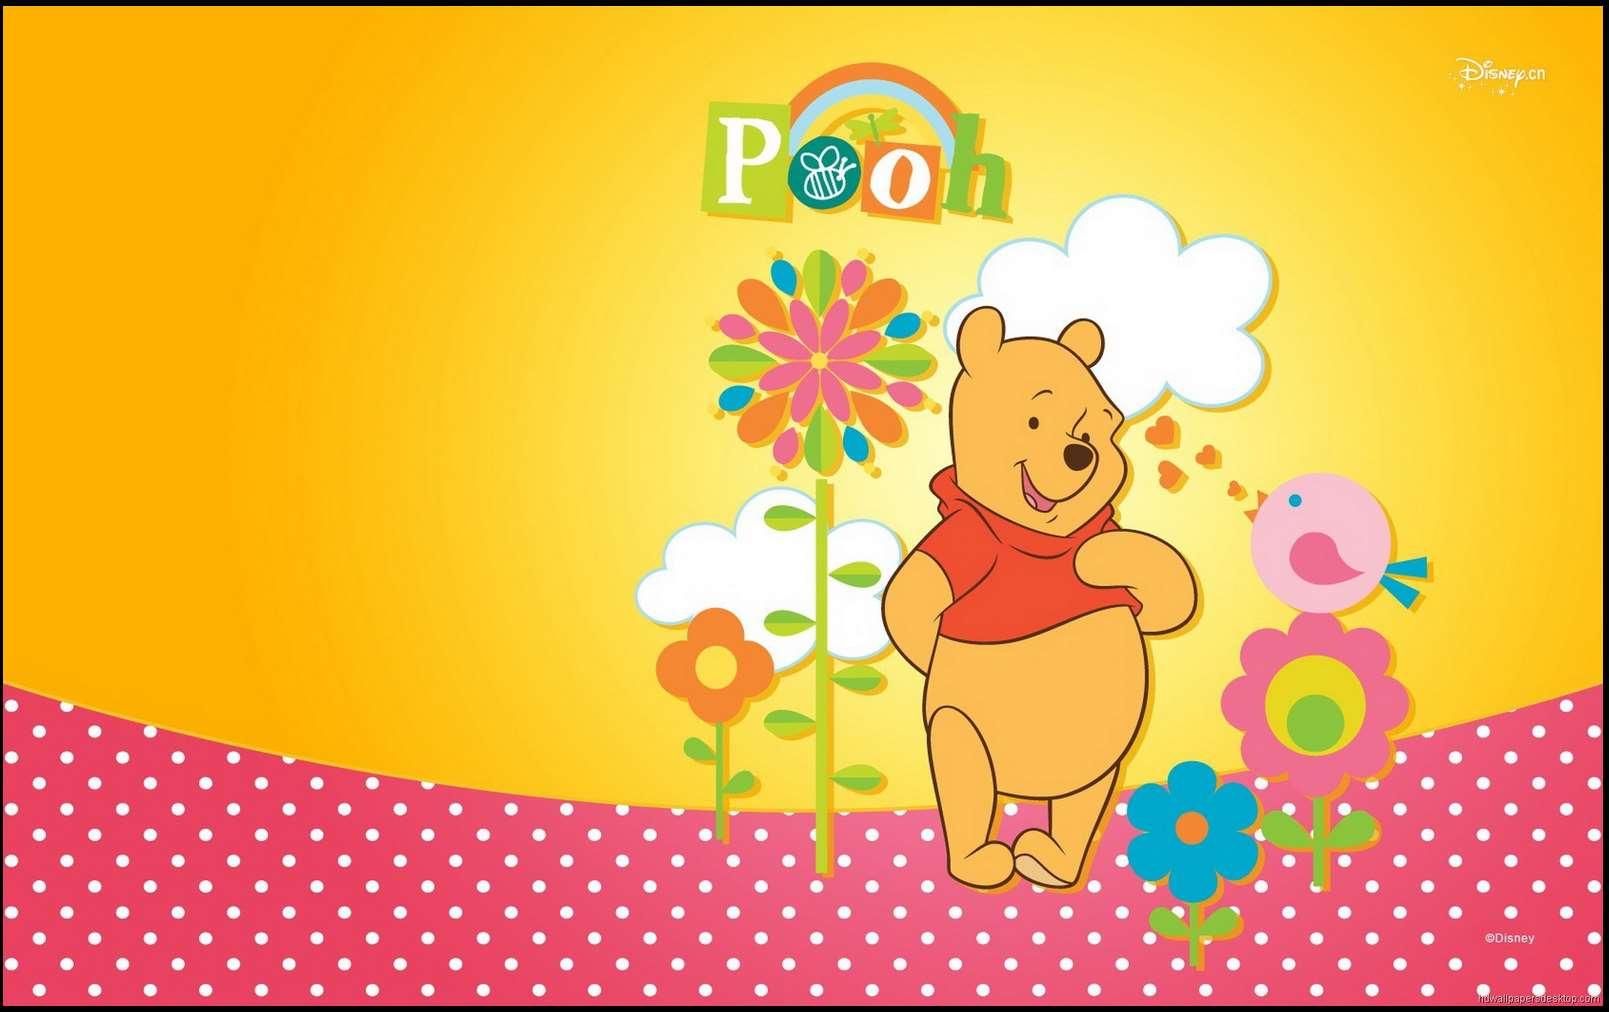 wallpaper-de-winnie-pooh